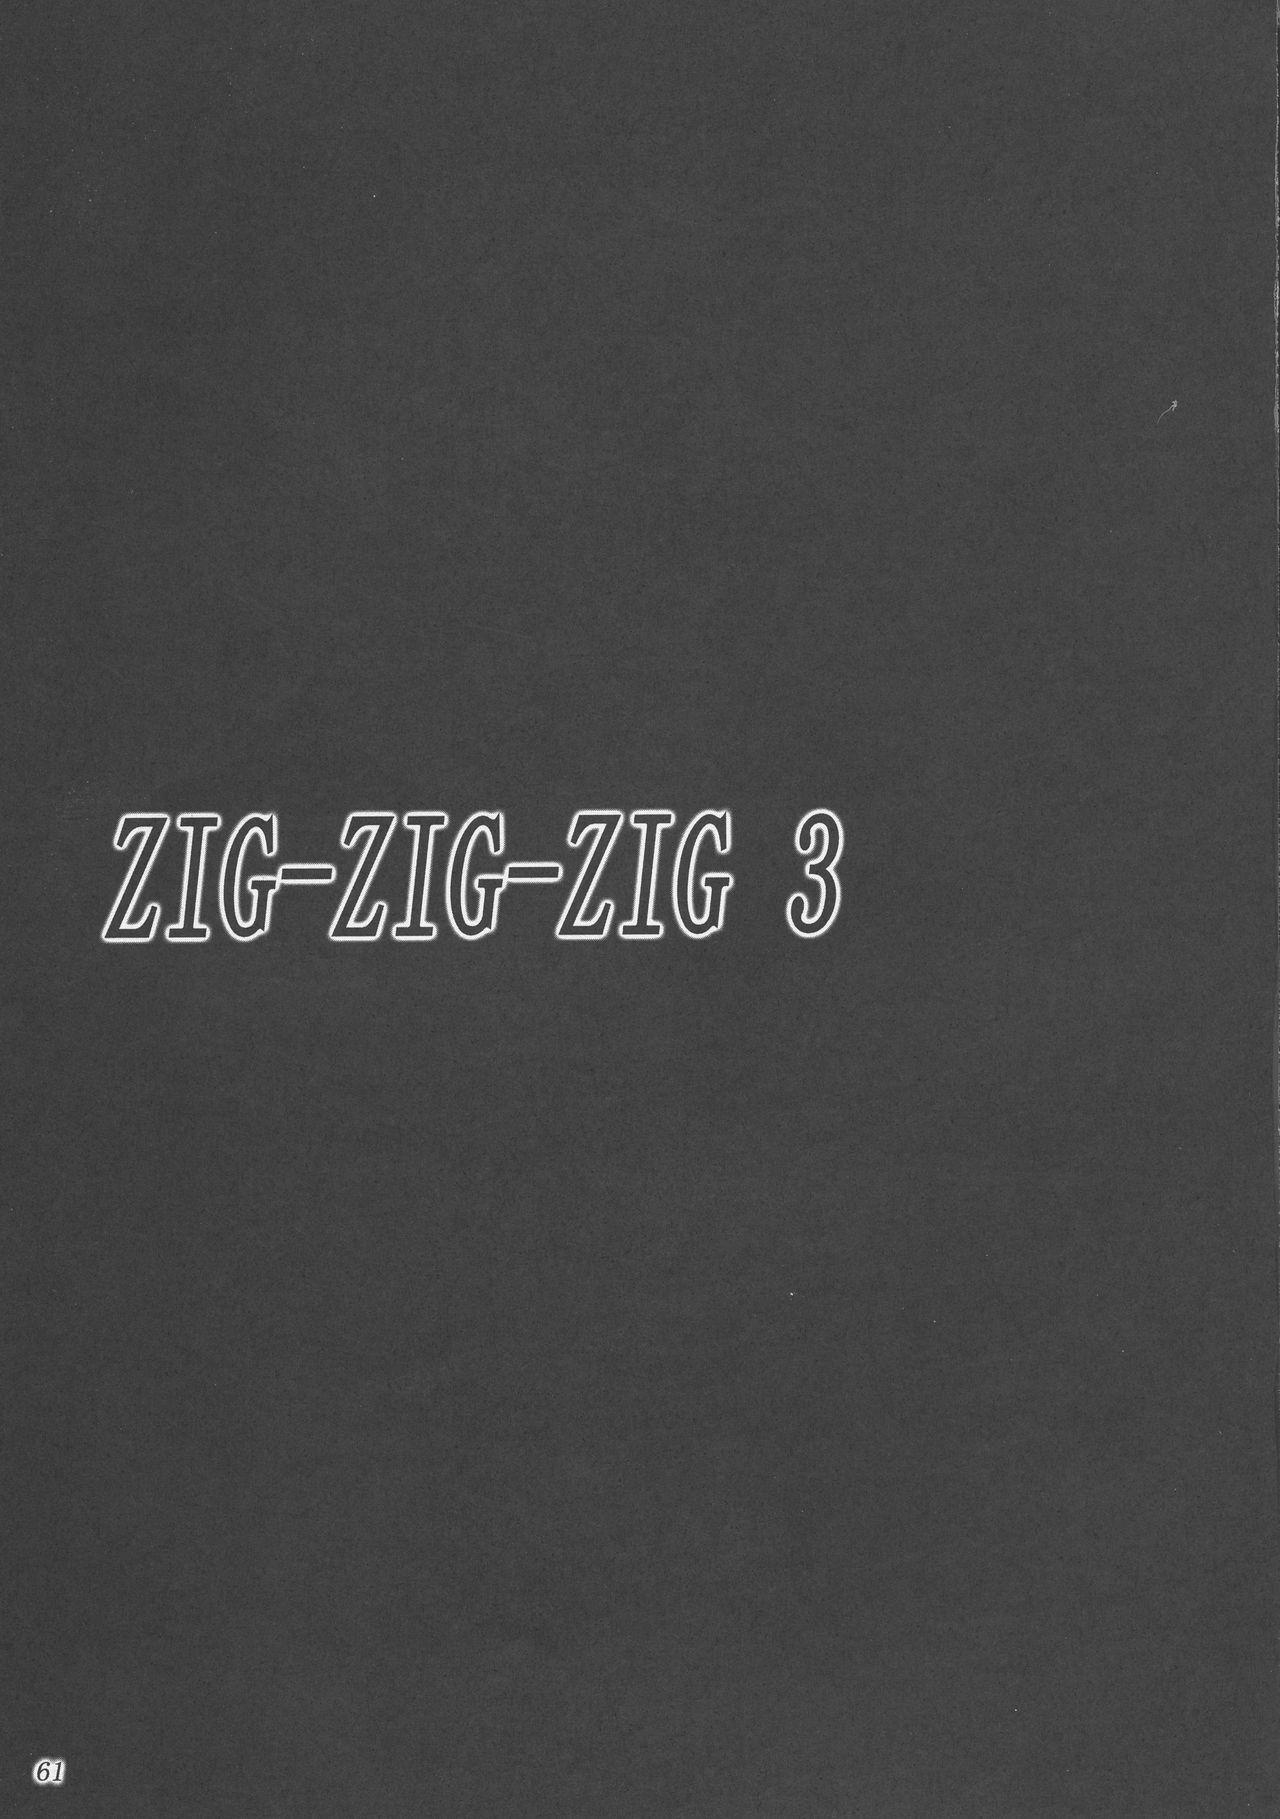 (C73) [ashitakara-ganbaru (Yameta Takashi)] ZIG-ZIG-ZIG 3 -2004~2005- (Various) 60